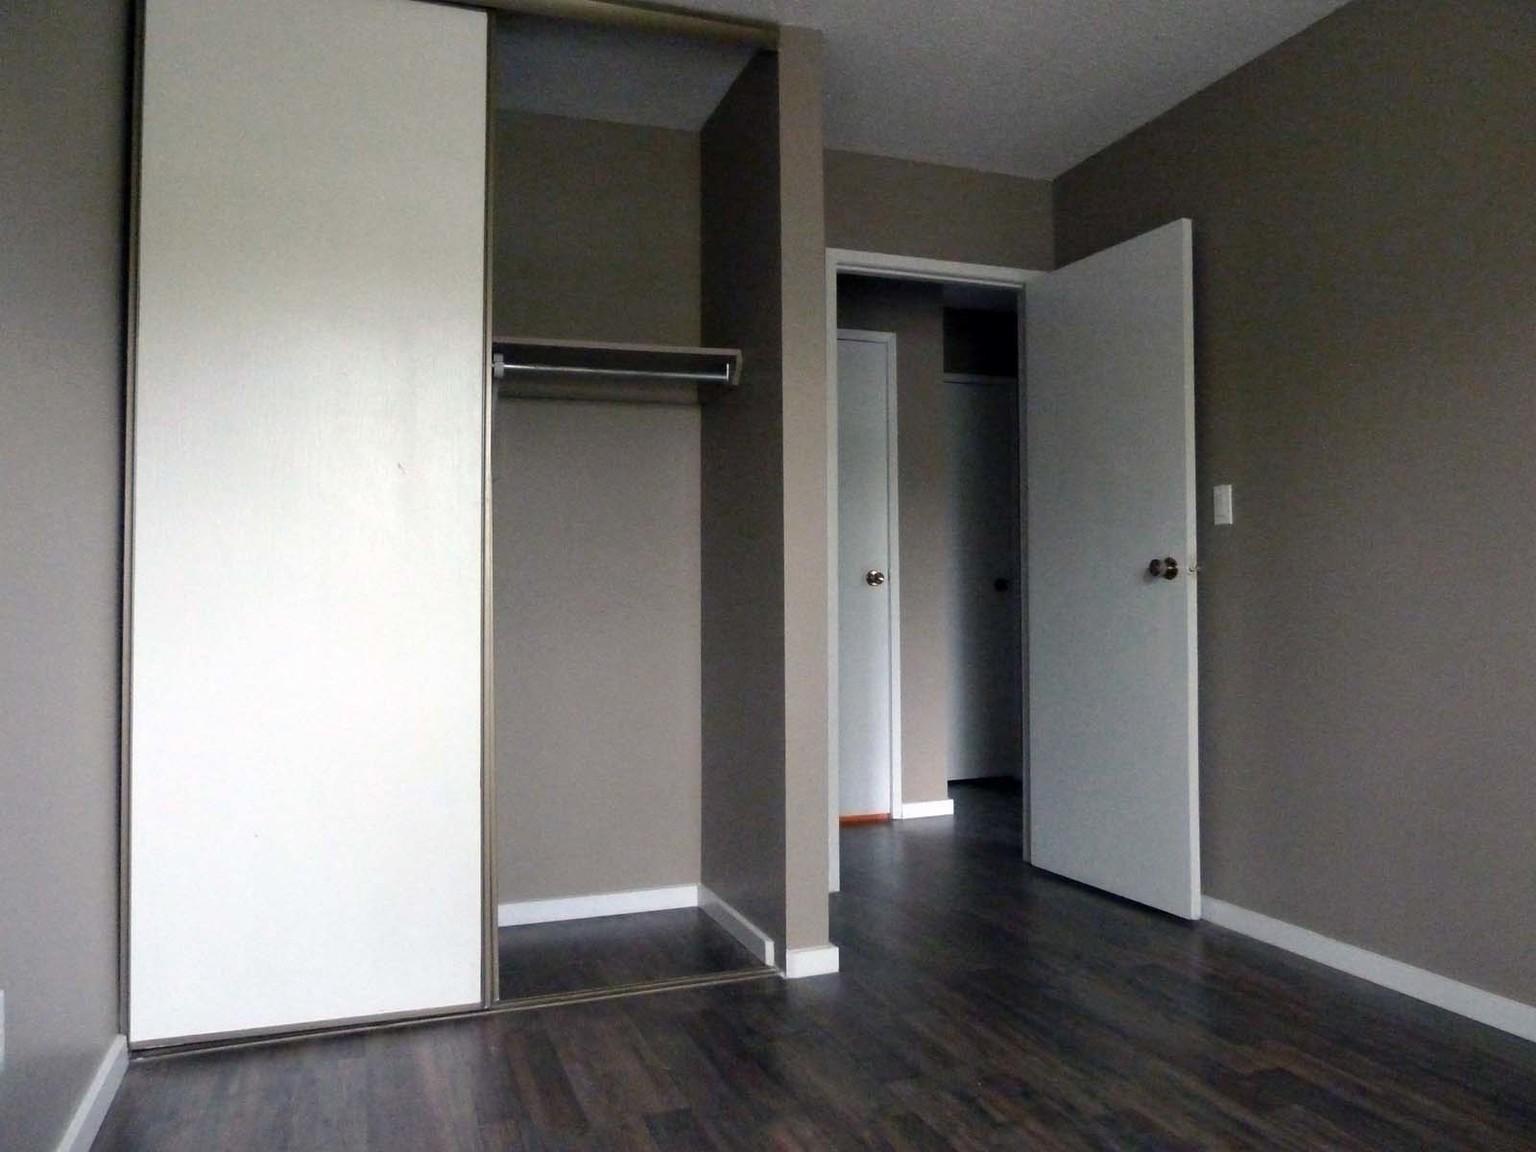 412 Huntsville Cres. NW, Calgary, AB - $925